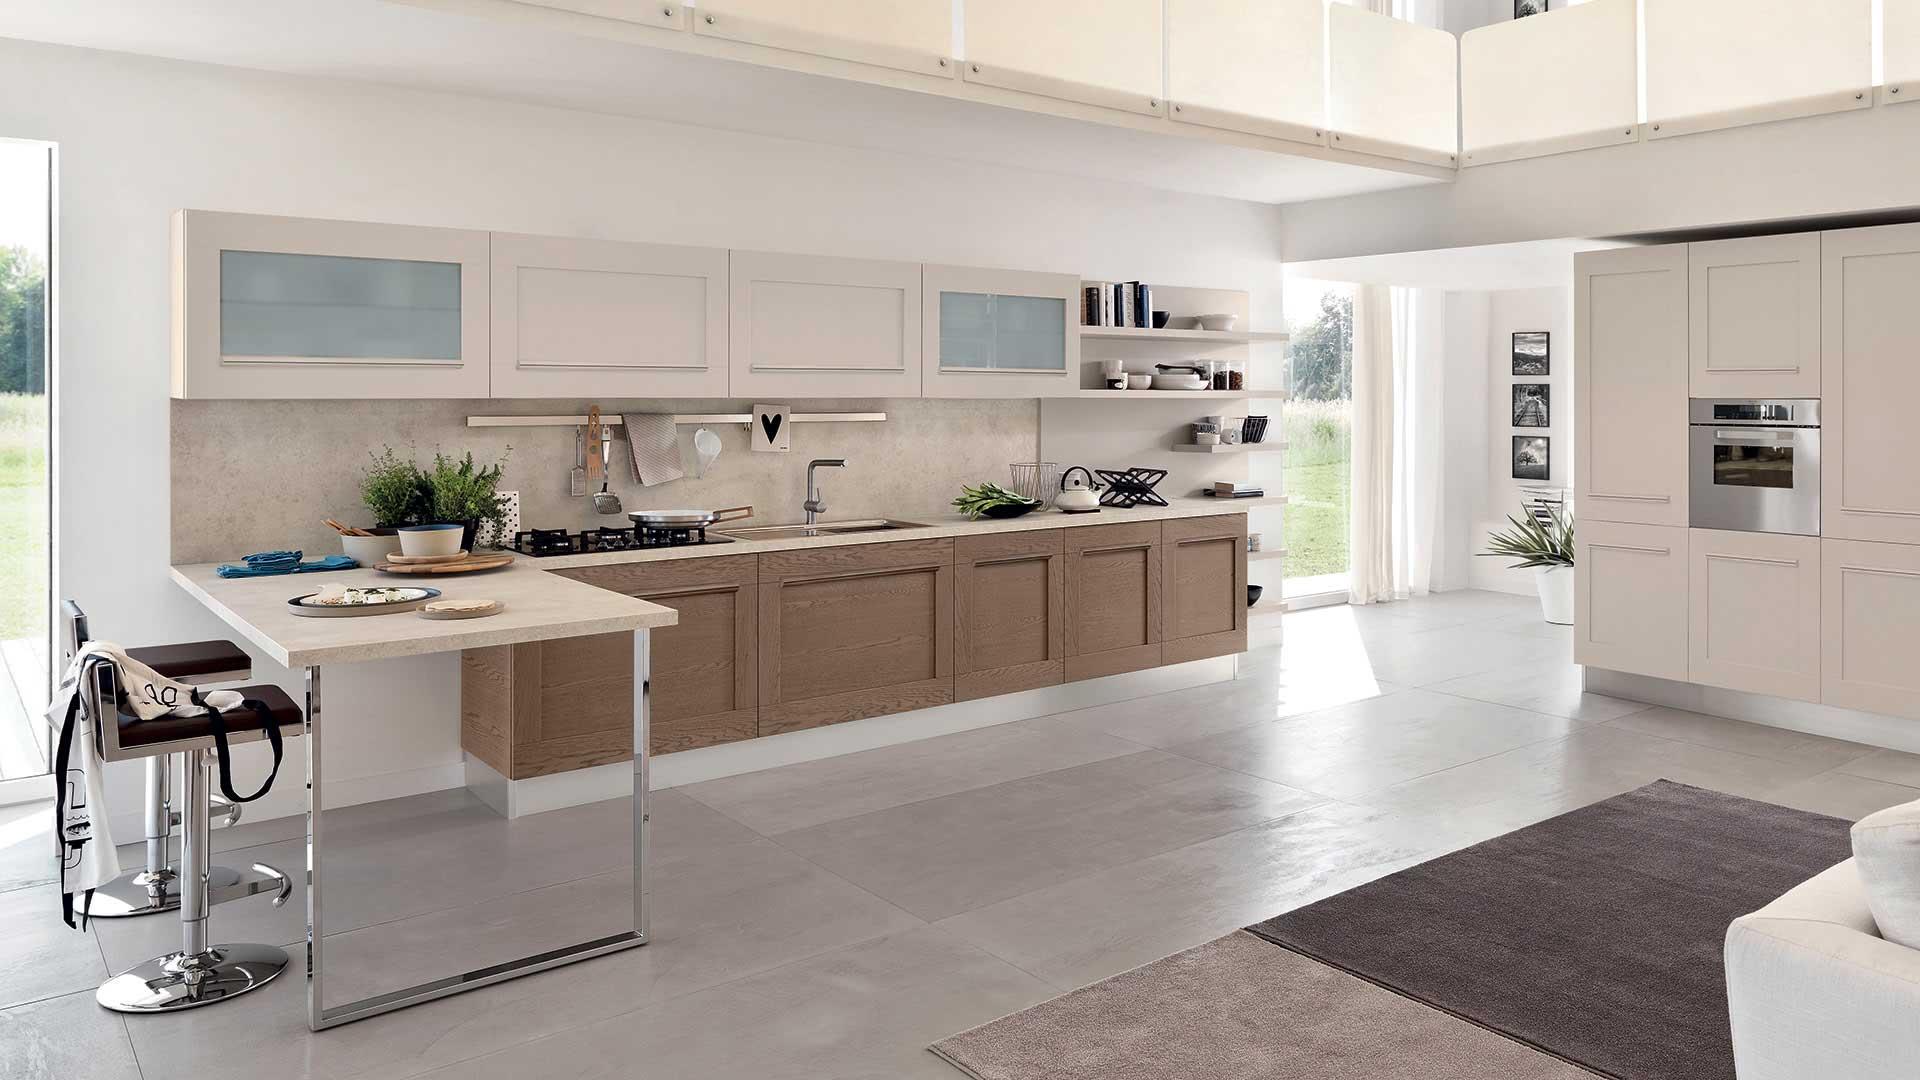 Gallery - Lube - Cucine Moderne